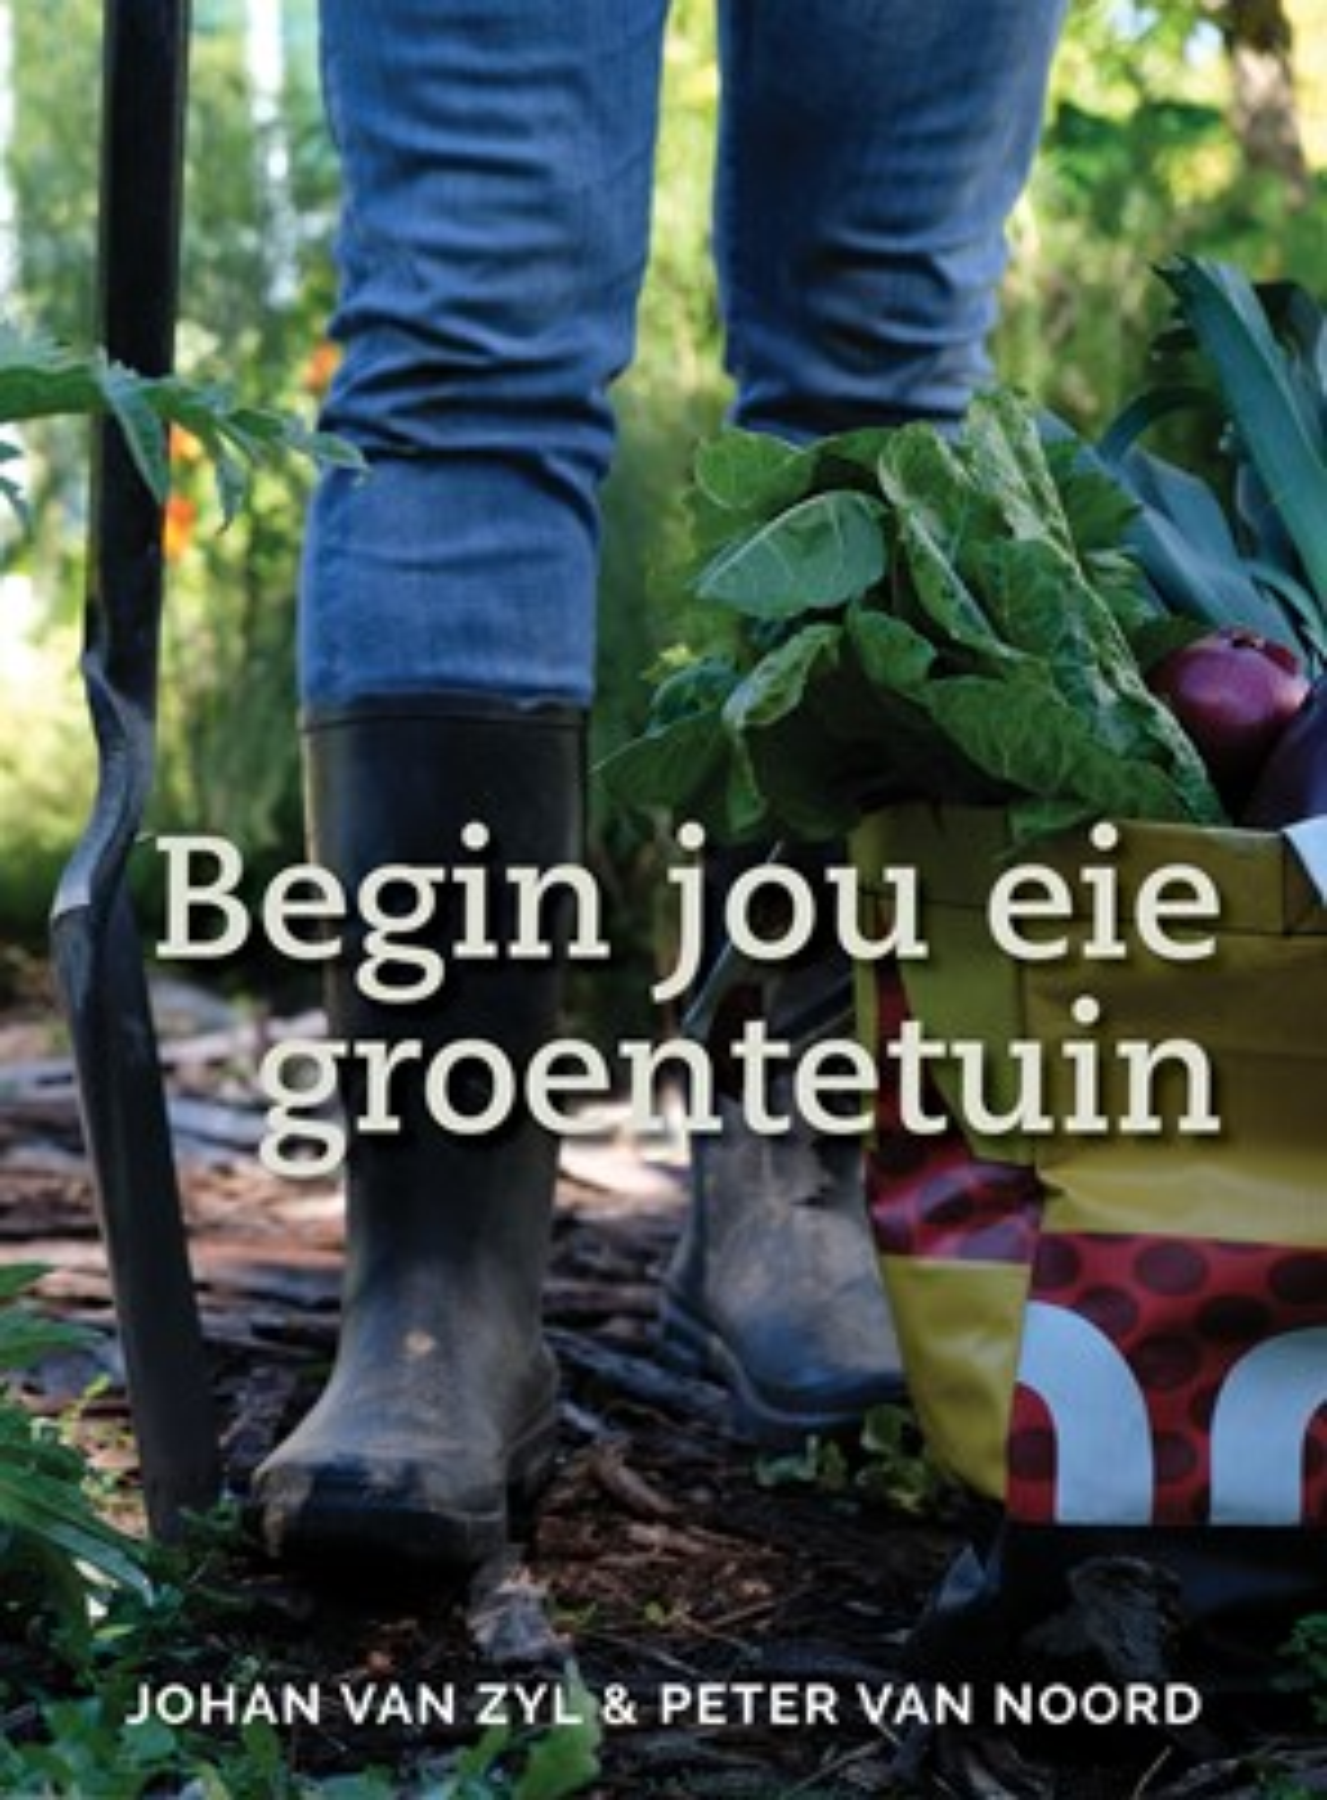 Picture of Begin jou eie groentetuin